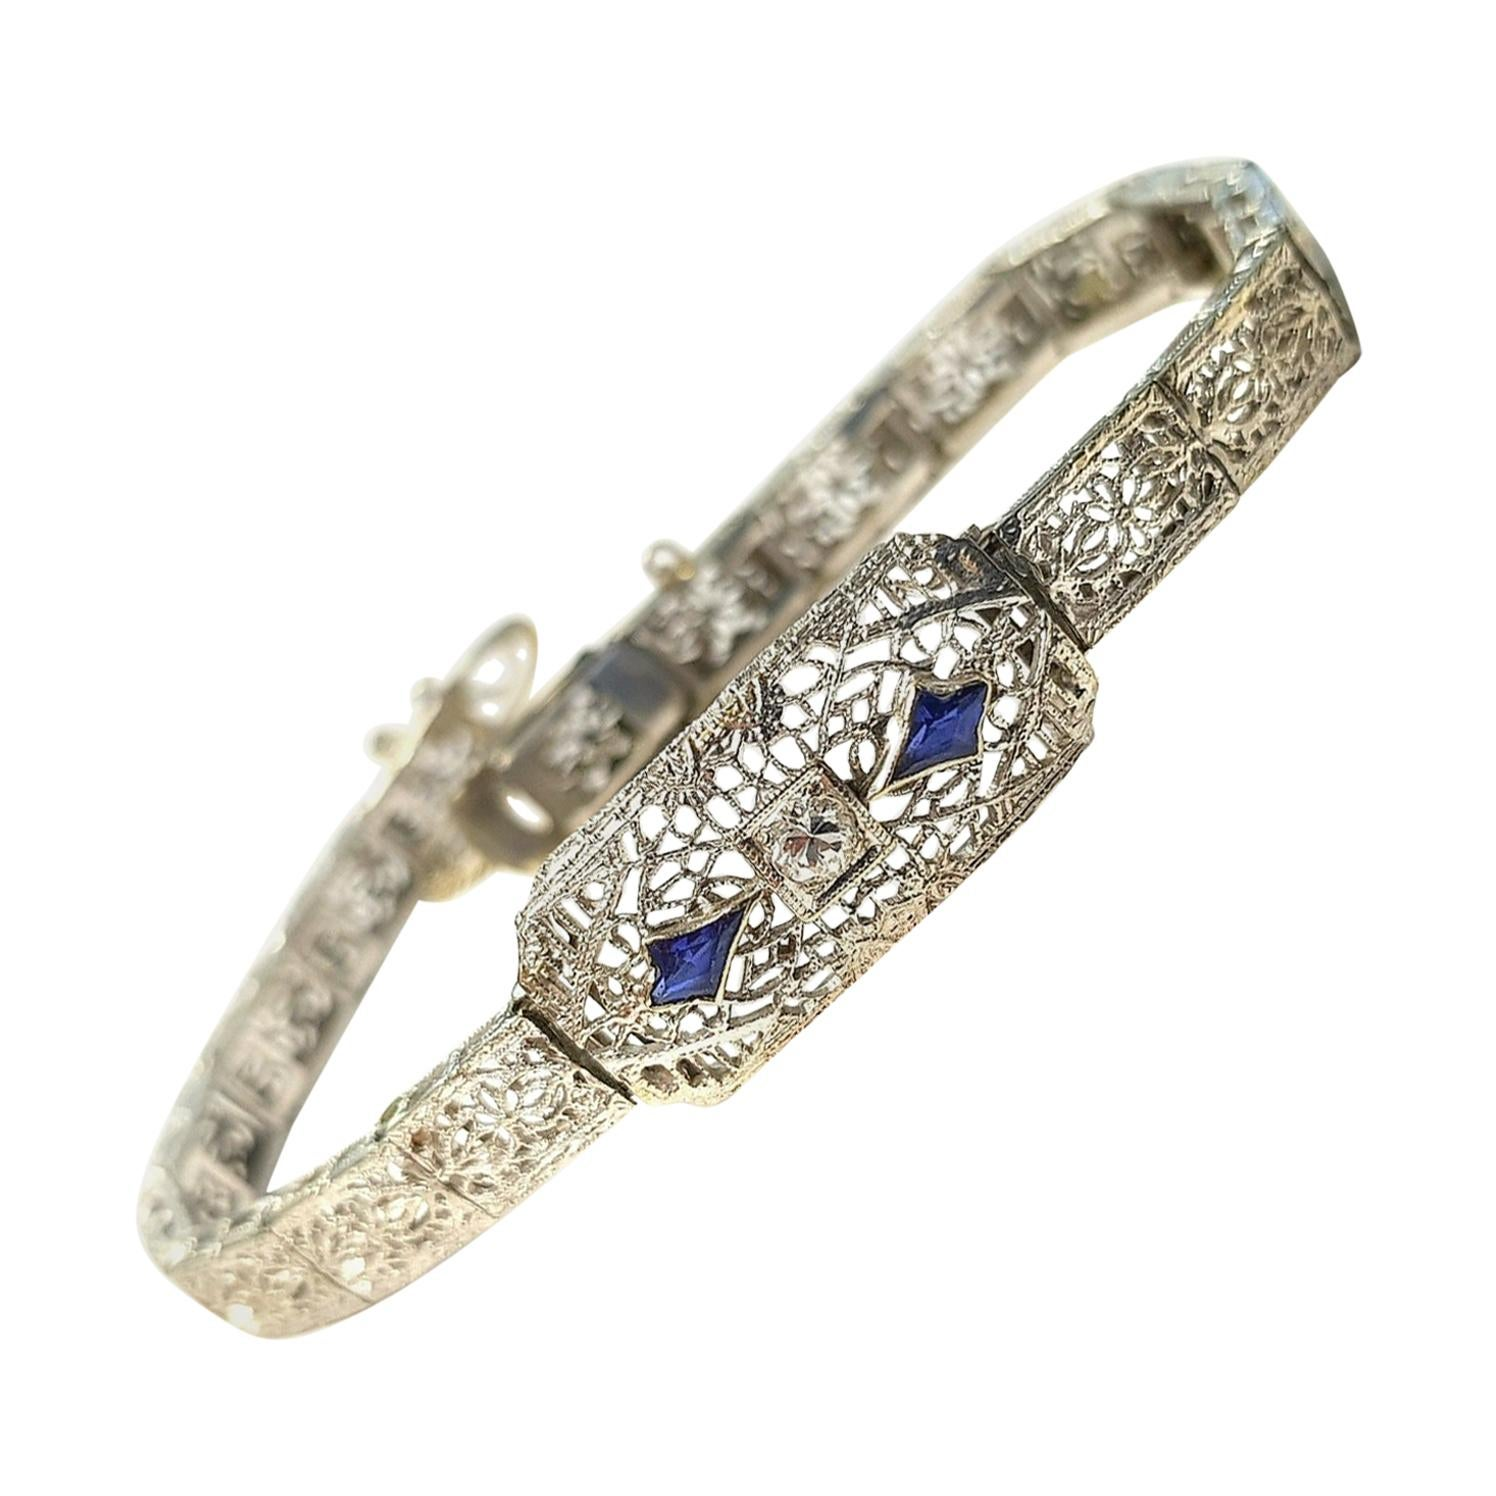 Art Deco Style 10 Karat Gold Bracelet with Sapphires and 0.10 Carat Diamond